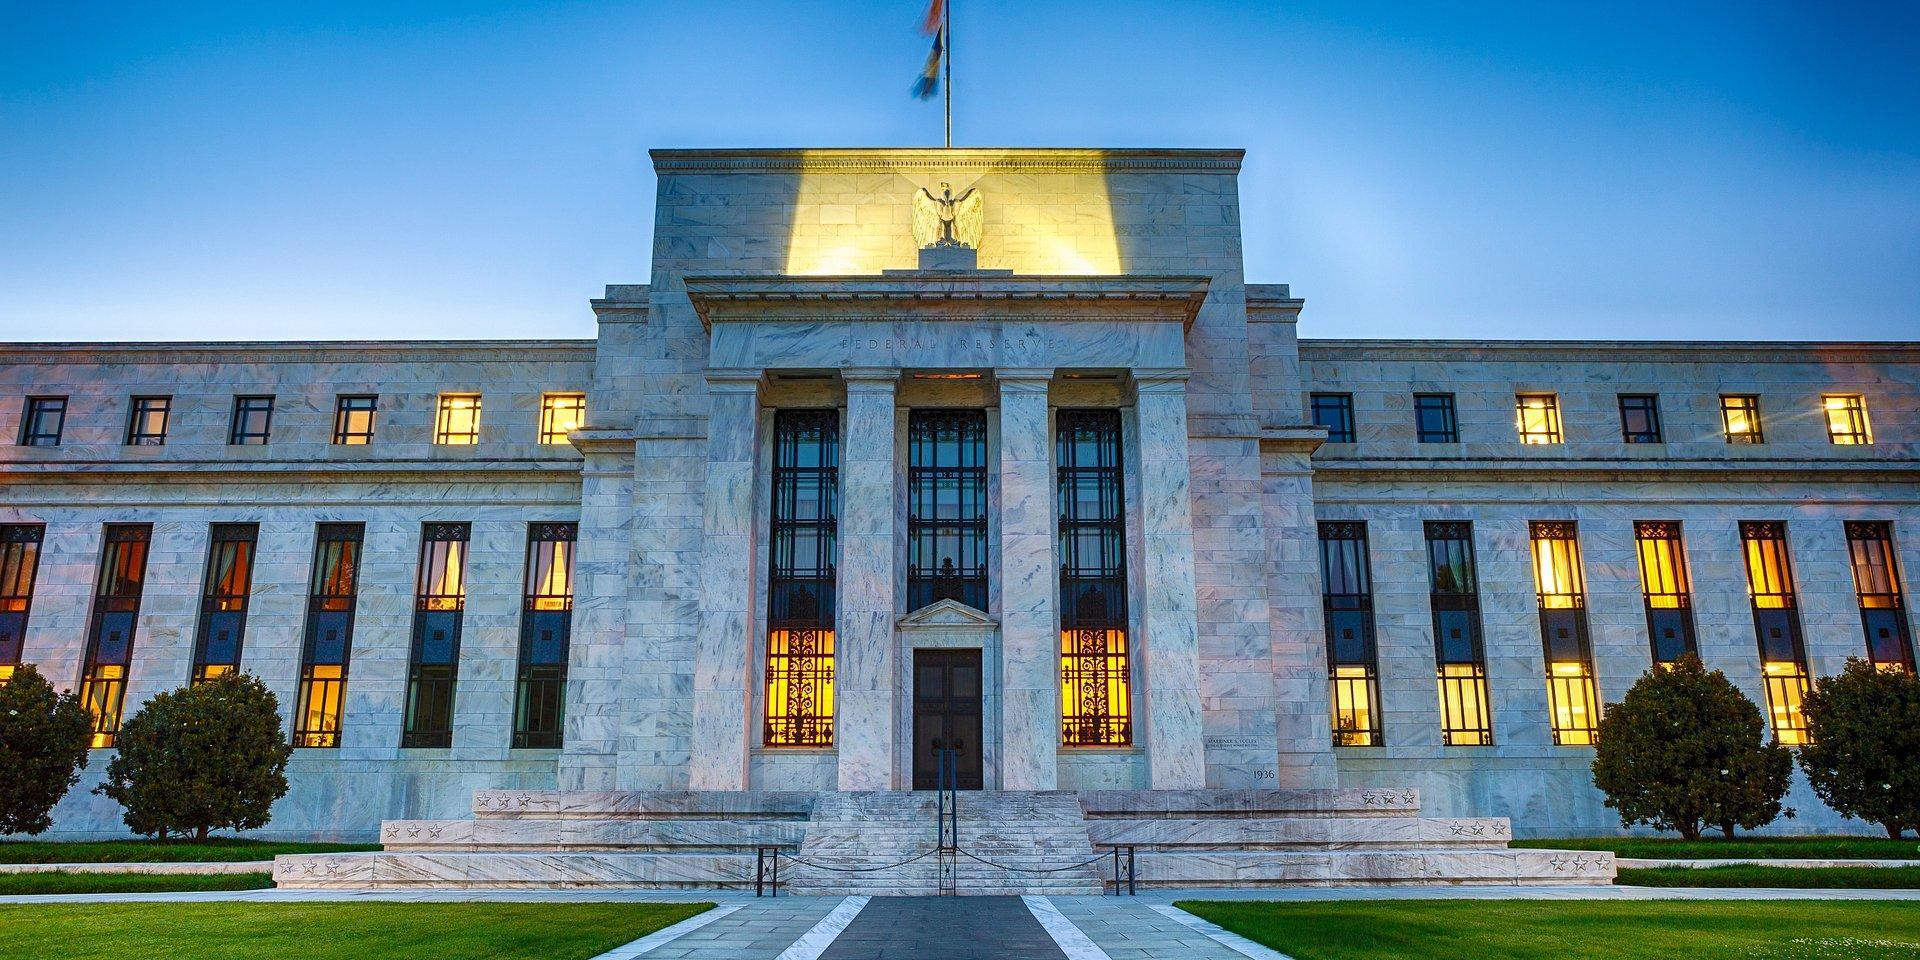 Fed: outcome based guidance